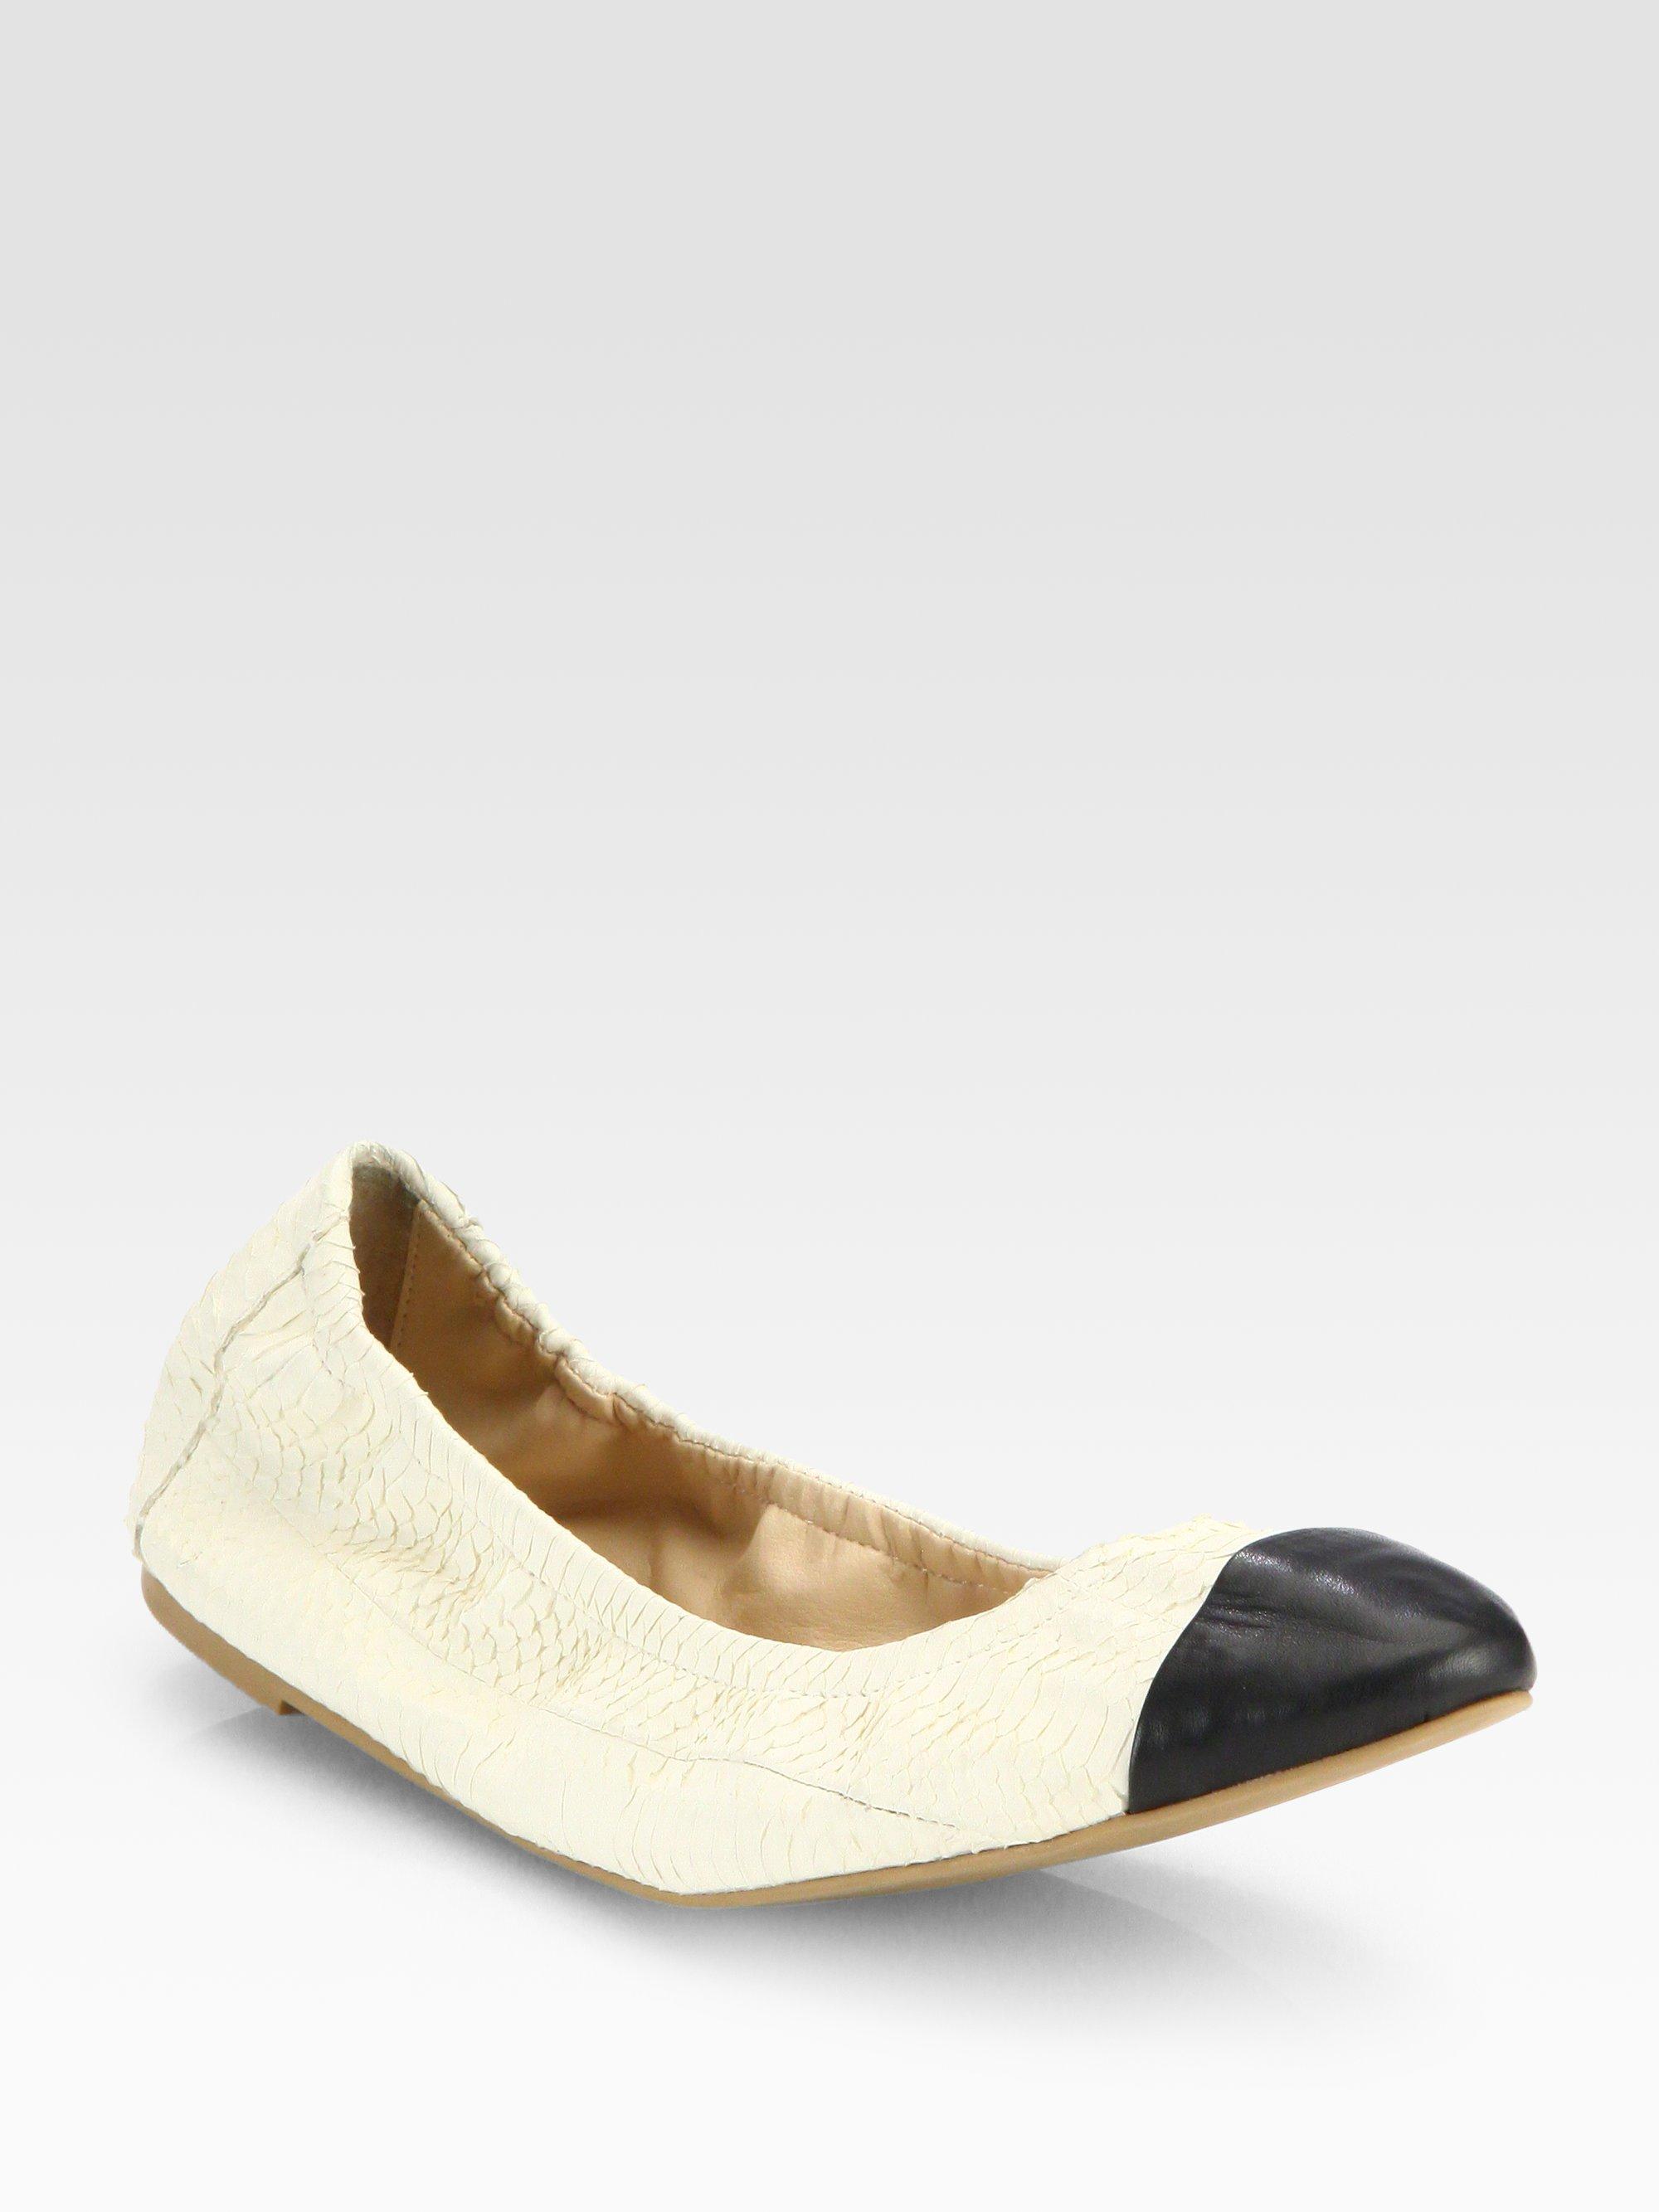 Loeffler Randall Leather Ballet Flats yI9Bj7